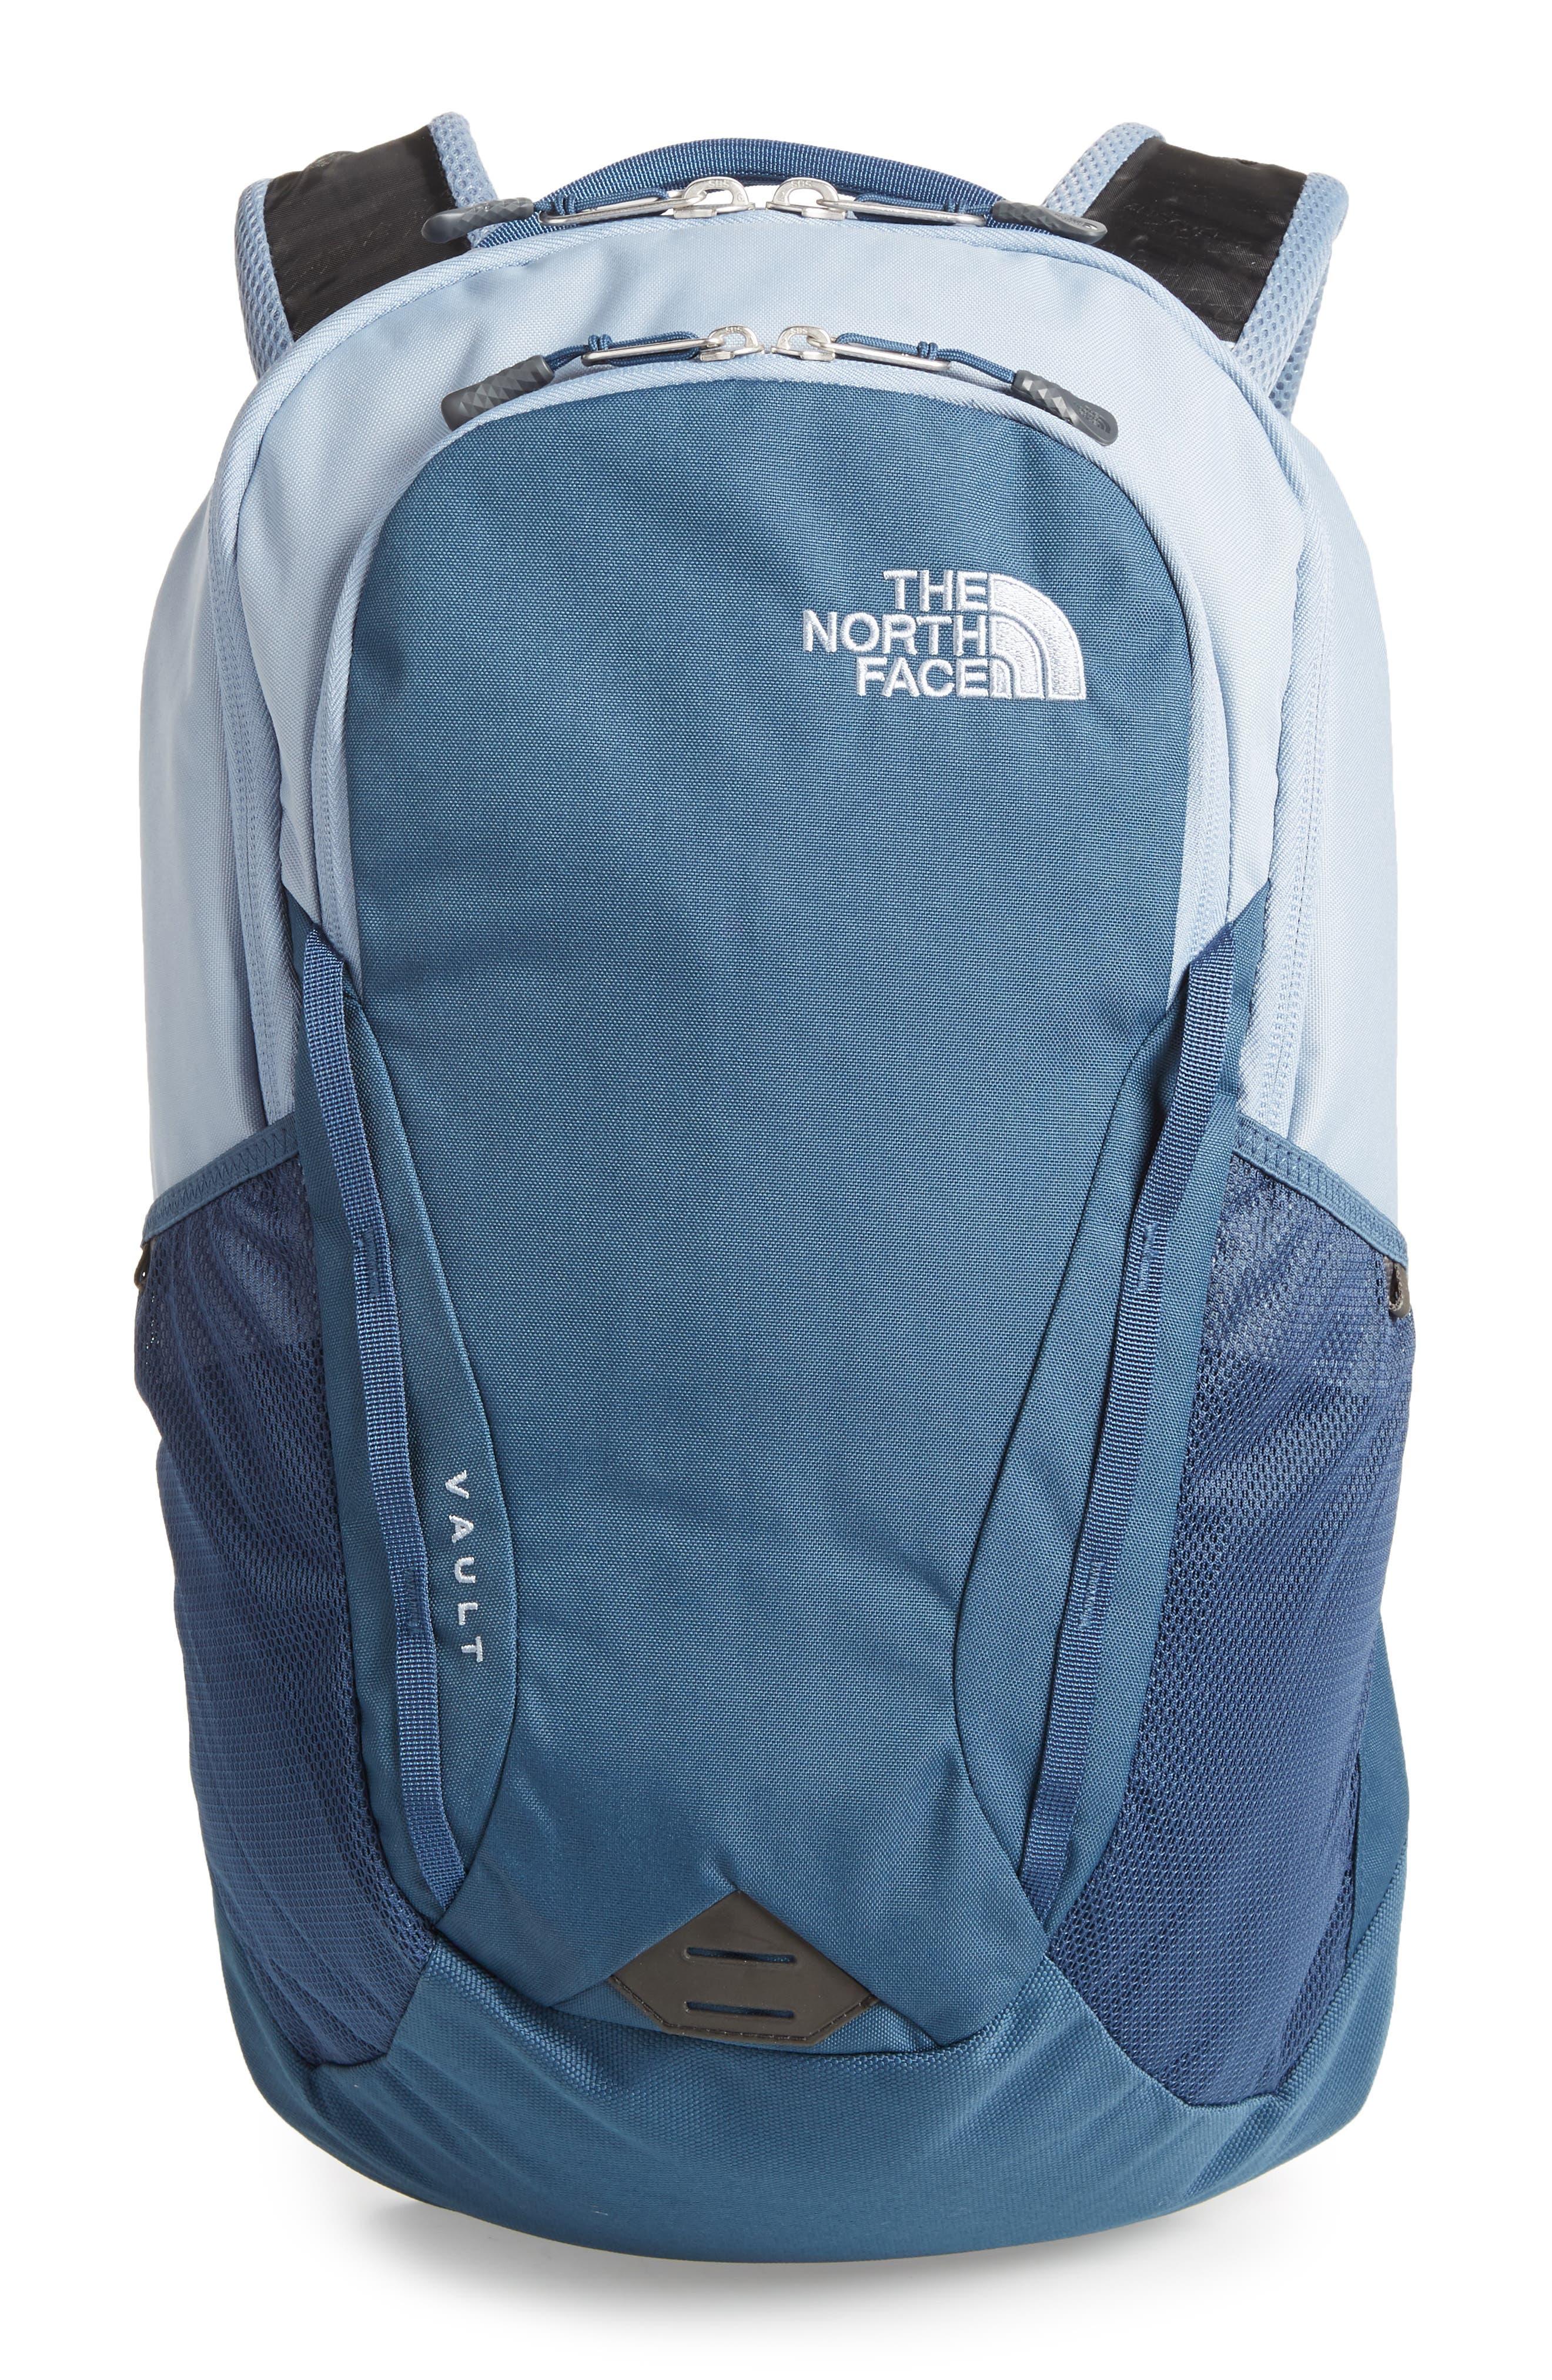 Vault Backpack,                             Main thumbnail 1, color,                             420